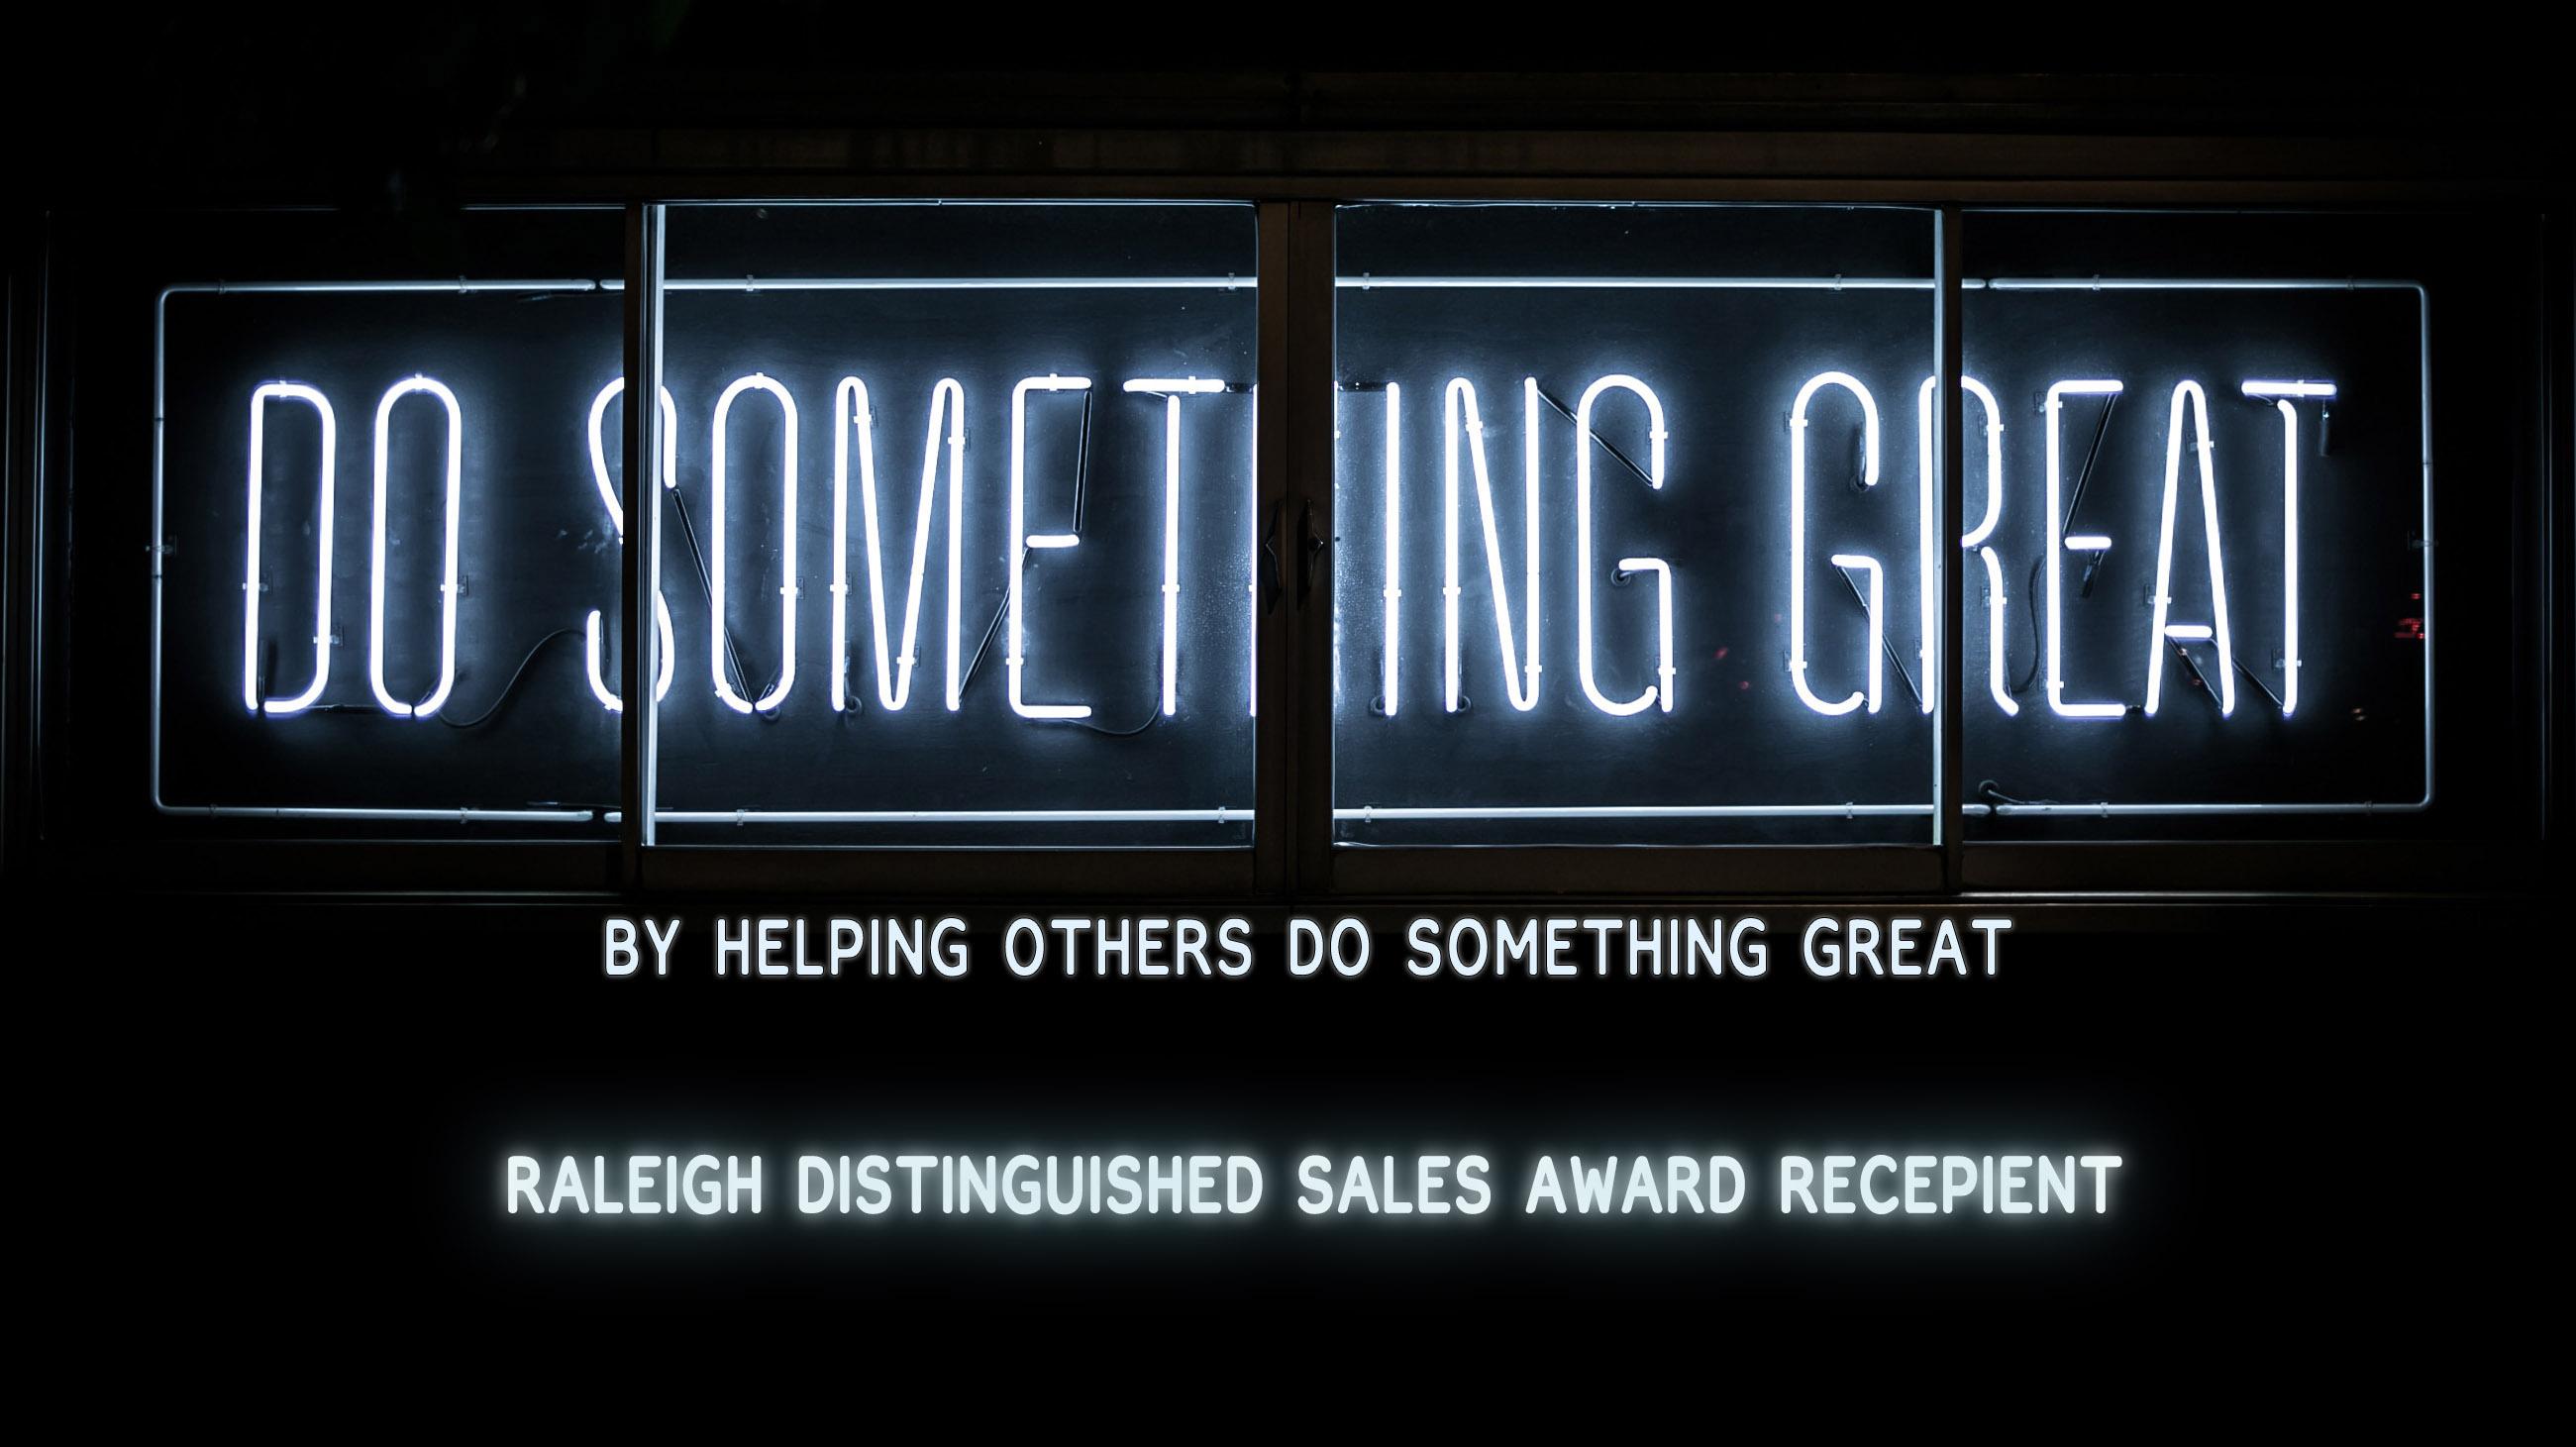 Raleigh Distinguished Sales Award Recipient